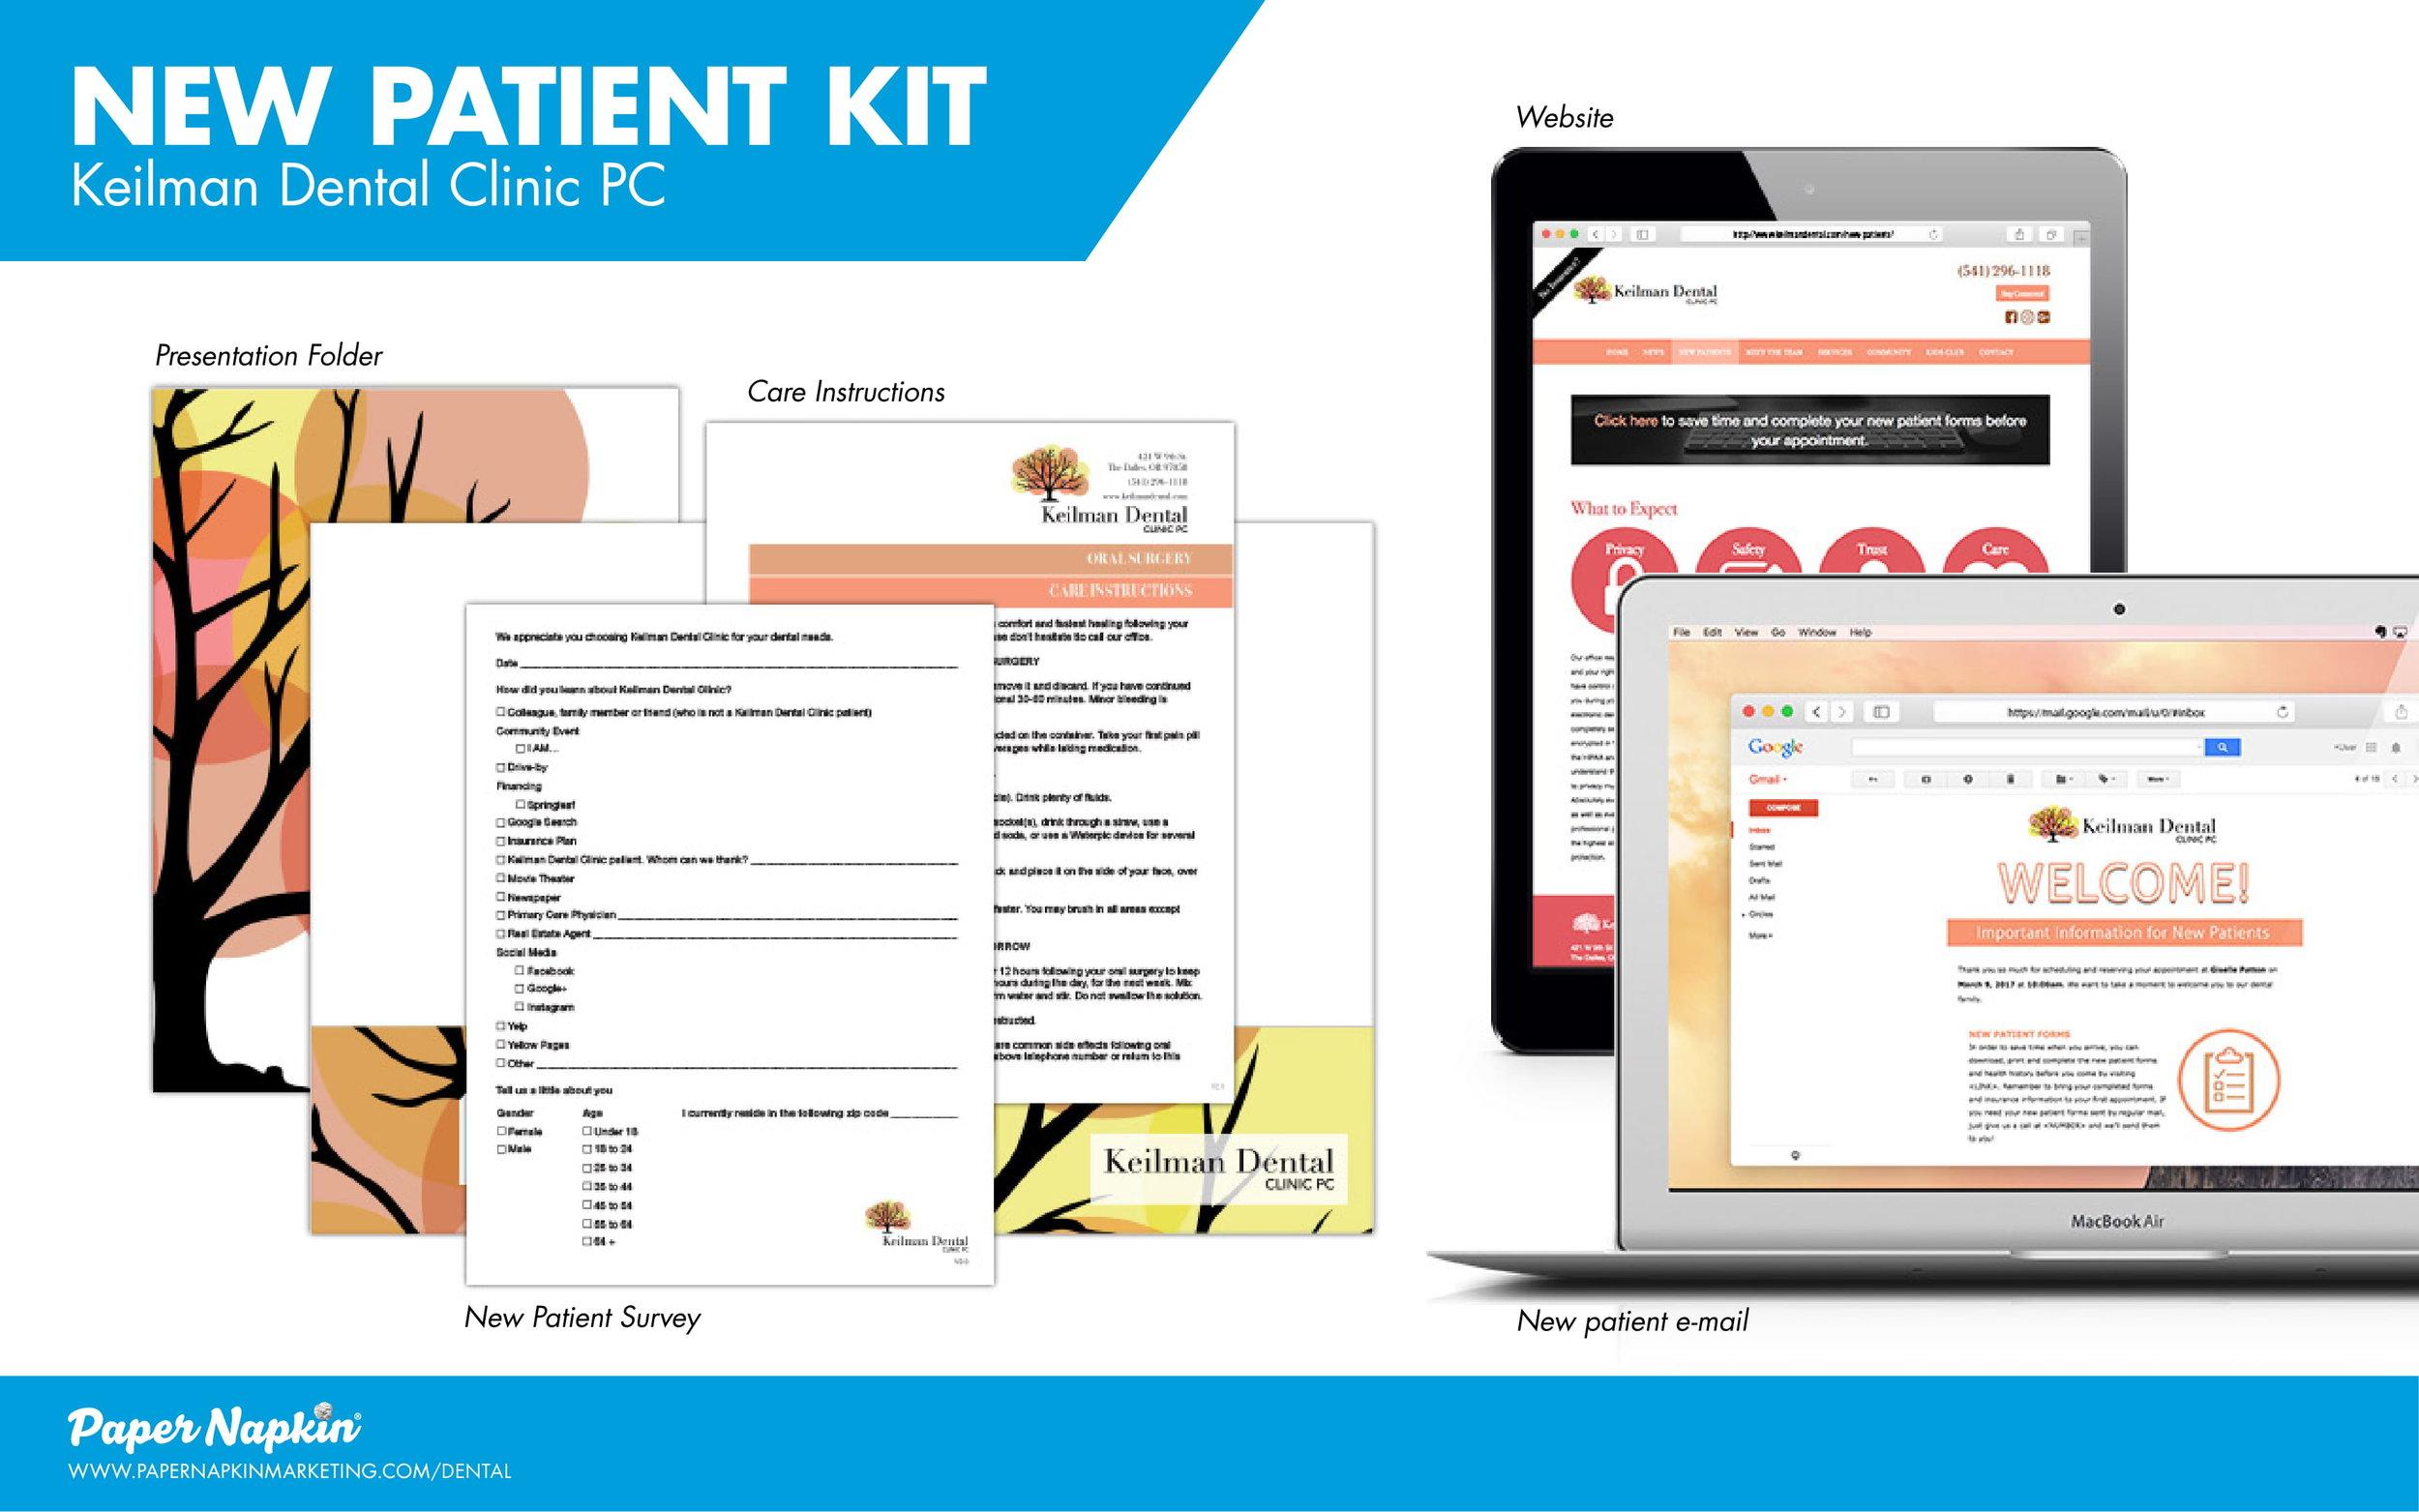 Keilman - New patient kit - 03 09 2017-1.jpg